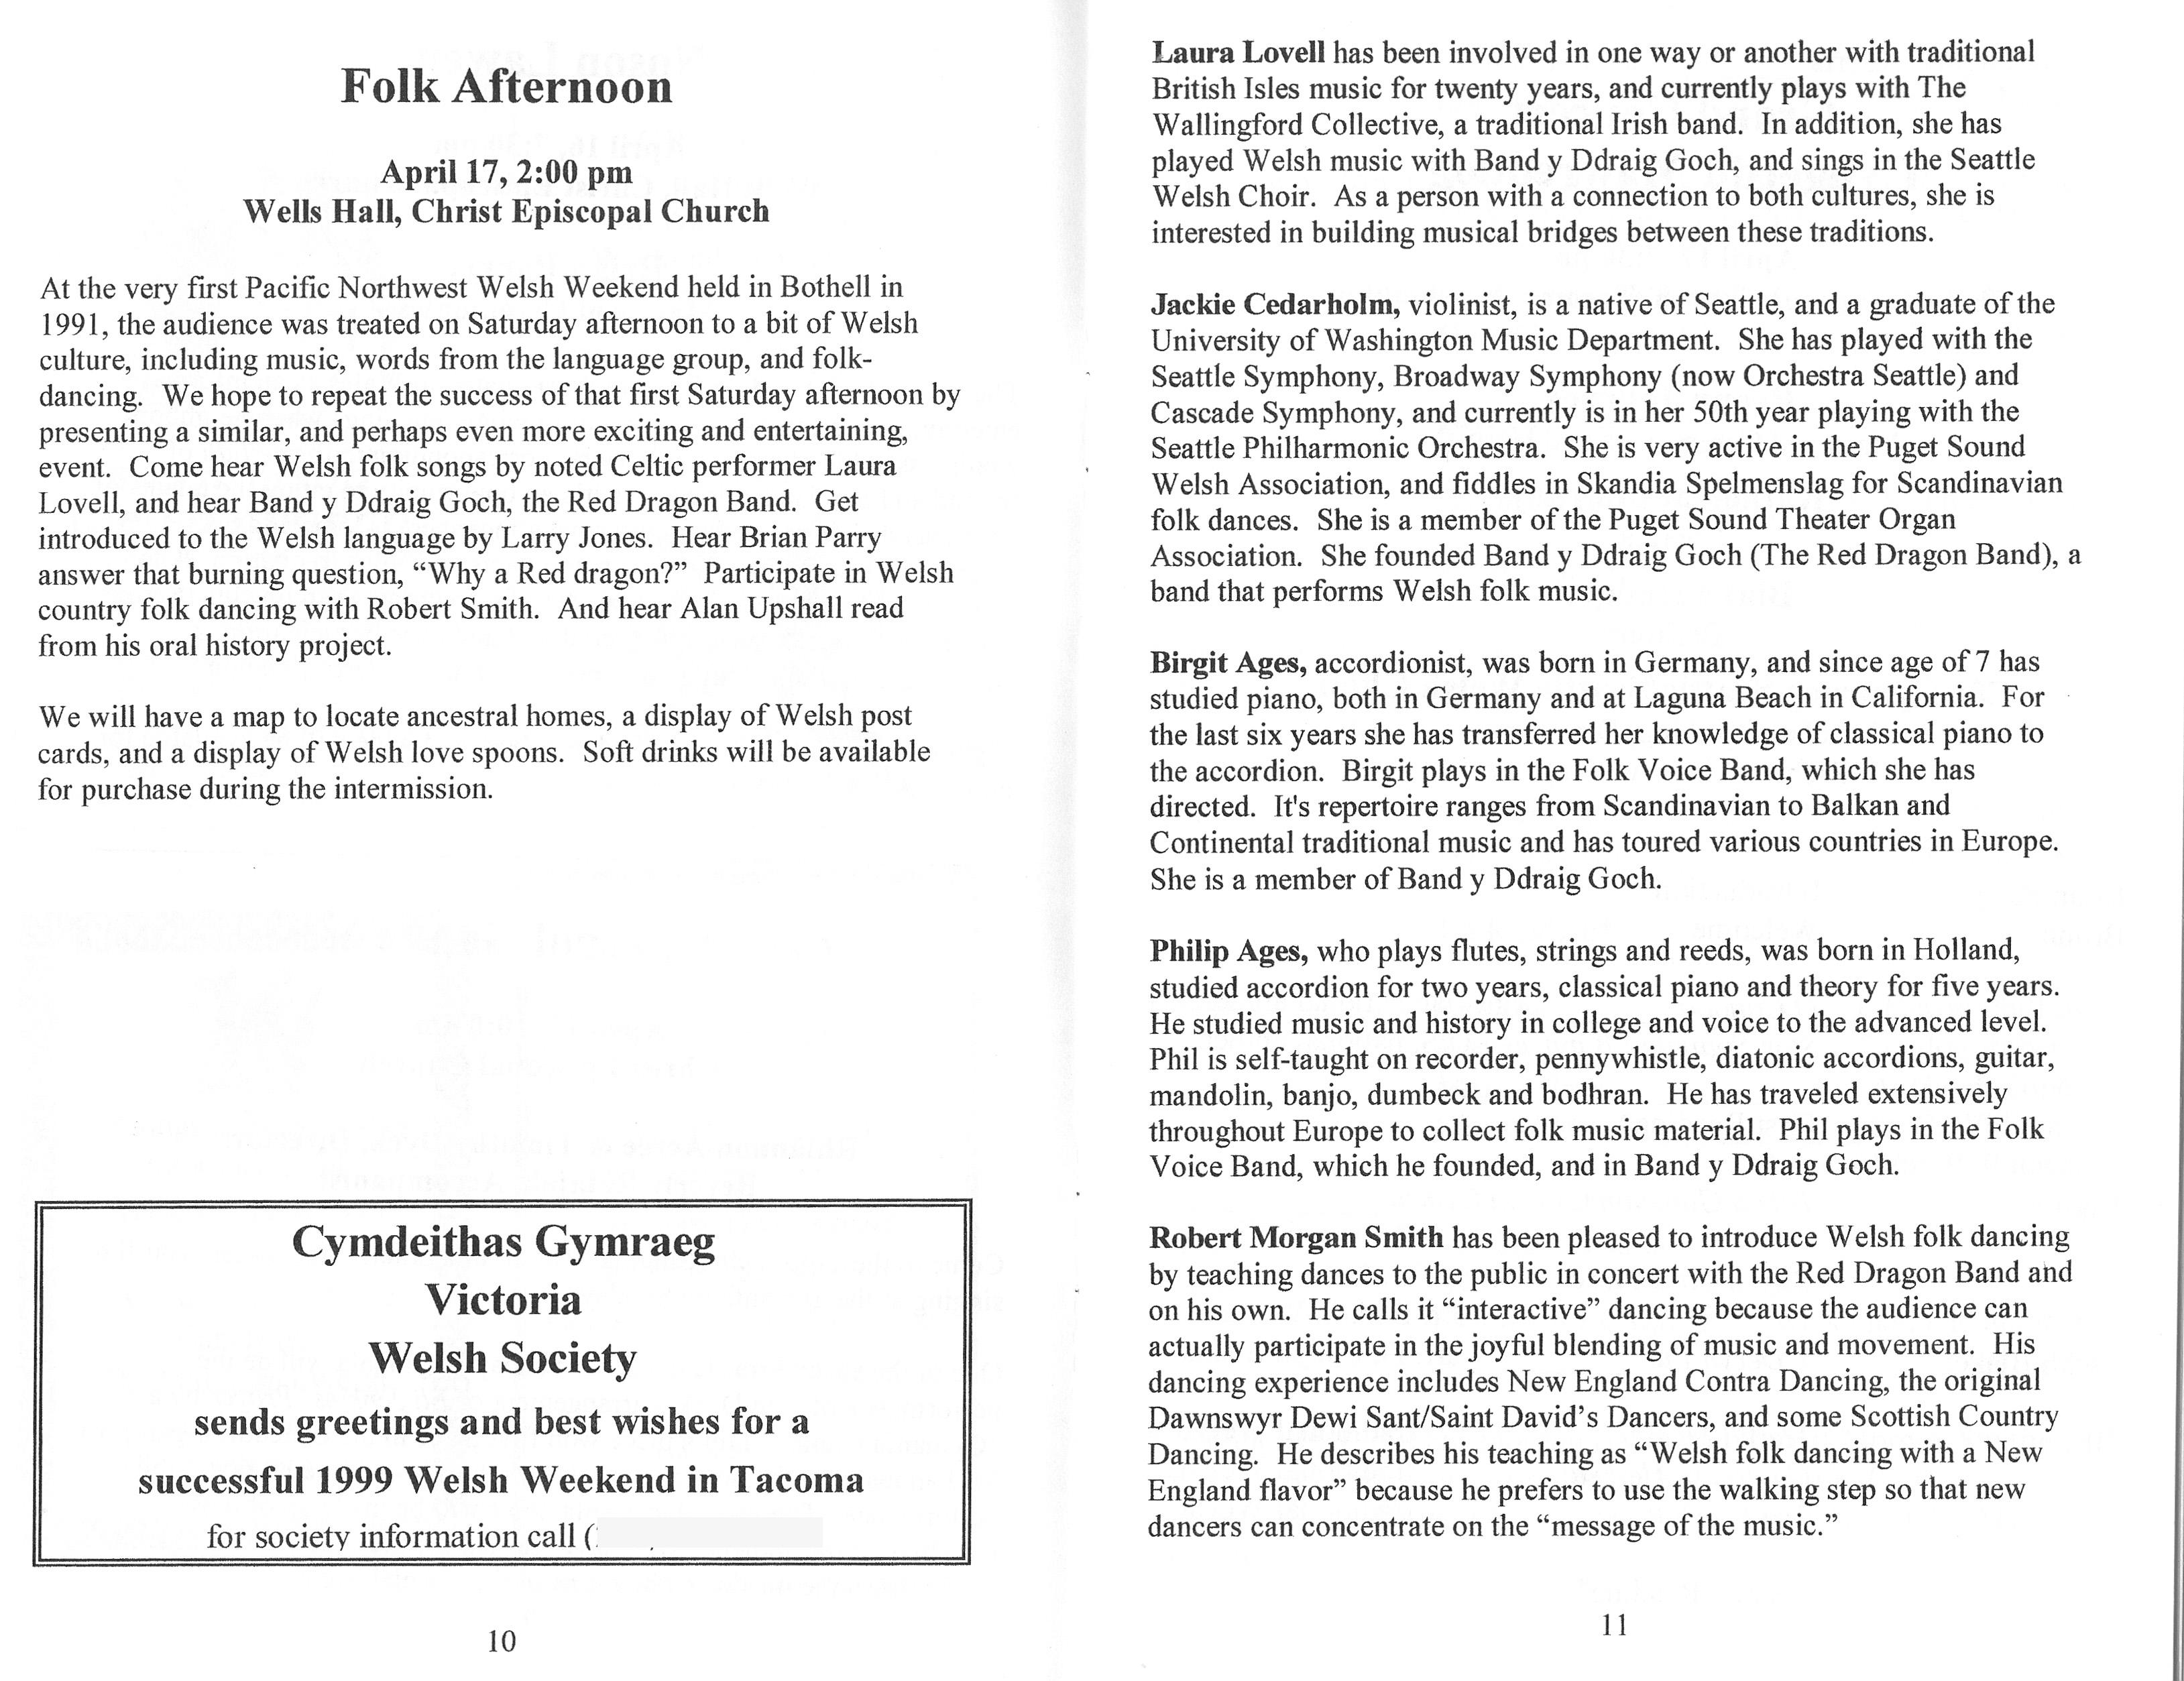 1999 Pacific Northwest Welsh Weekend Handbook